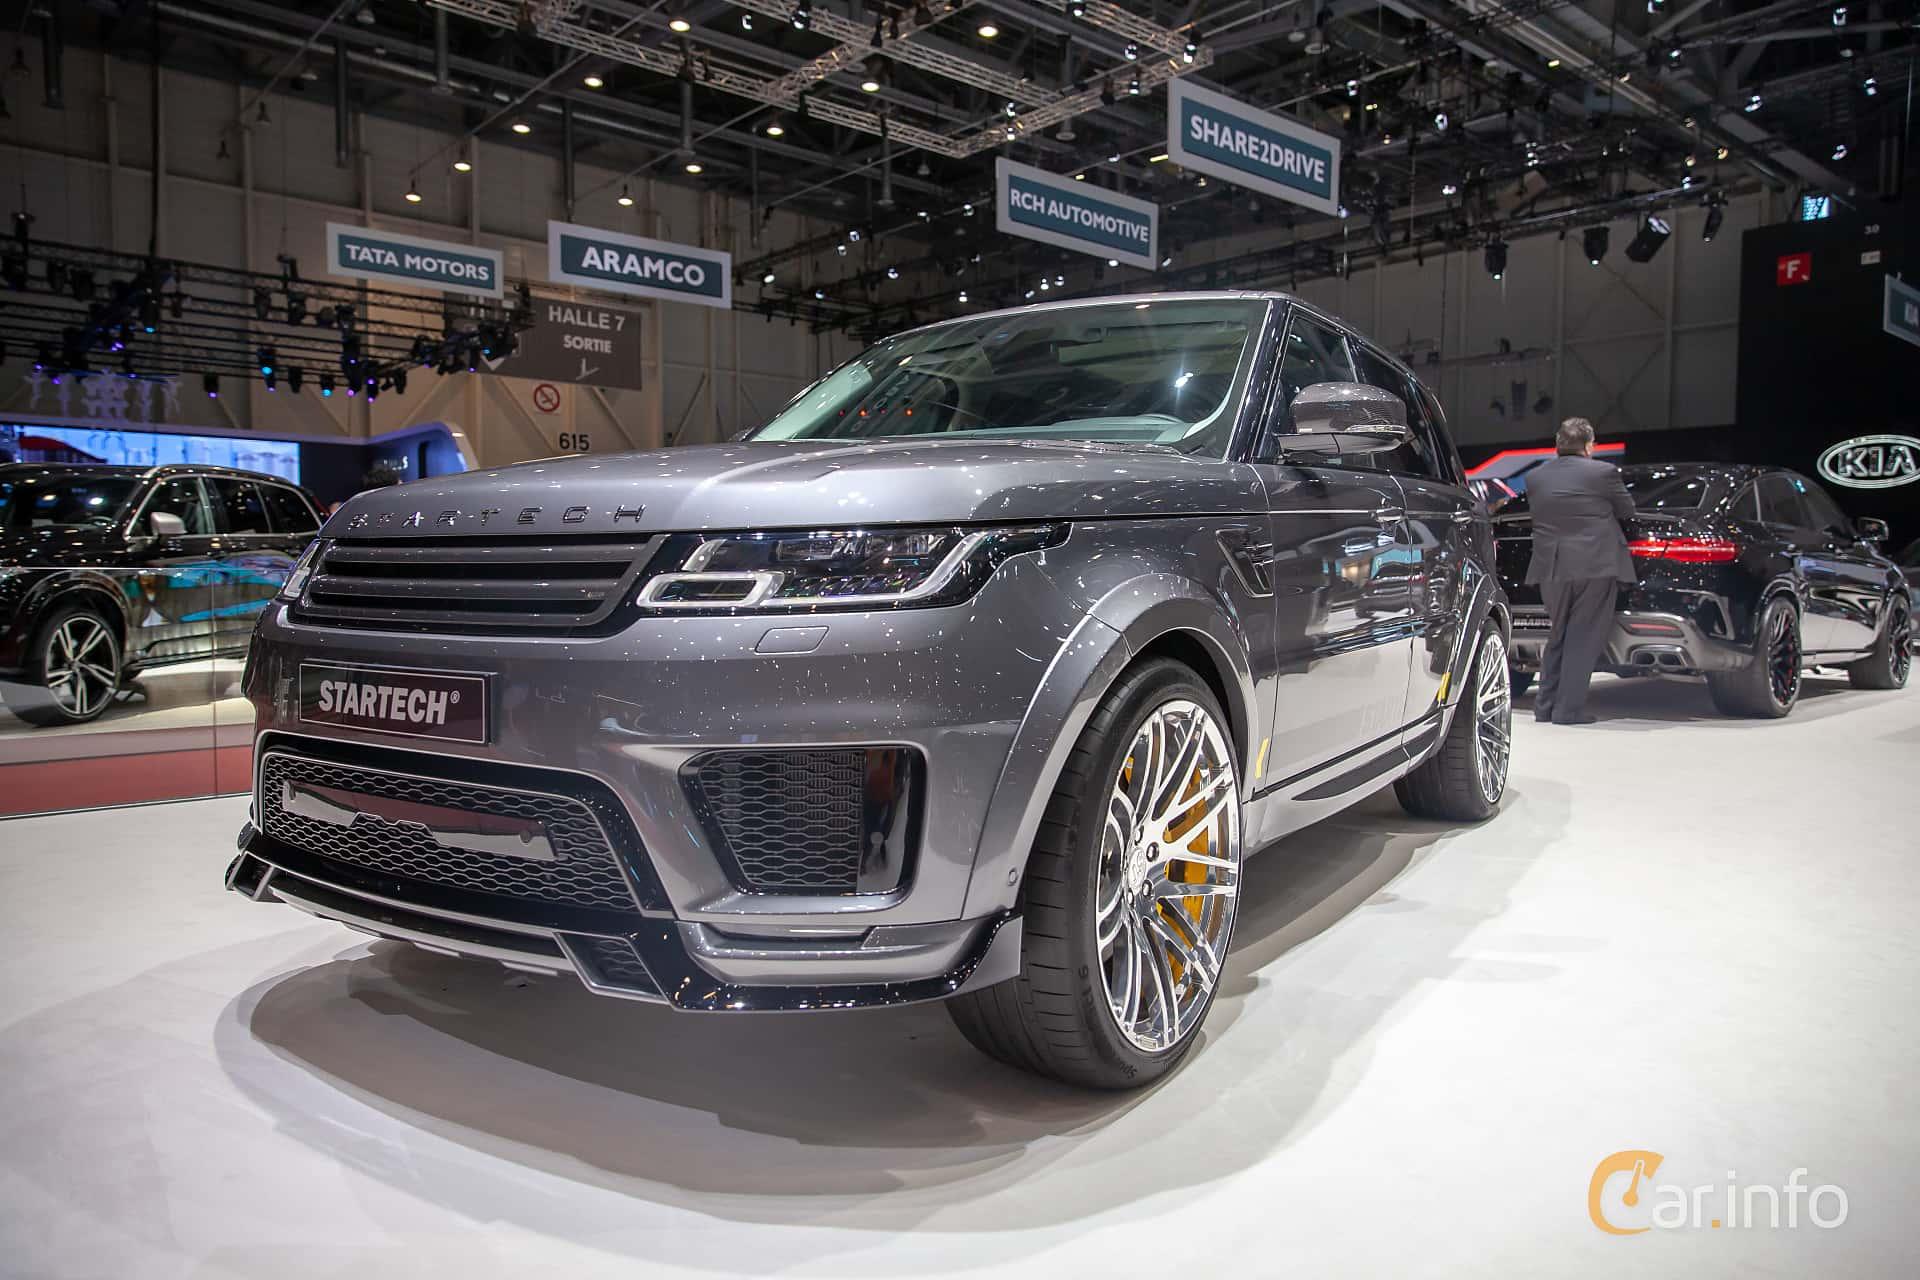 STARTECH Range Rover Sport 5.0 V8 4WD Automatic, 525hp, 2019 at Geneva Motor Show 2019